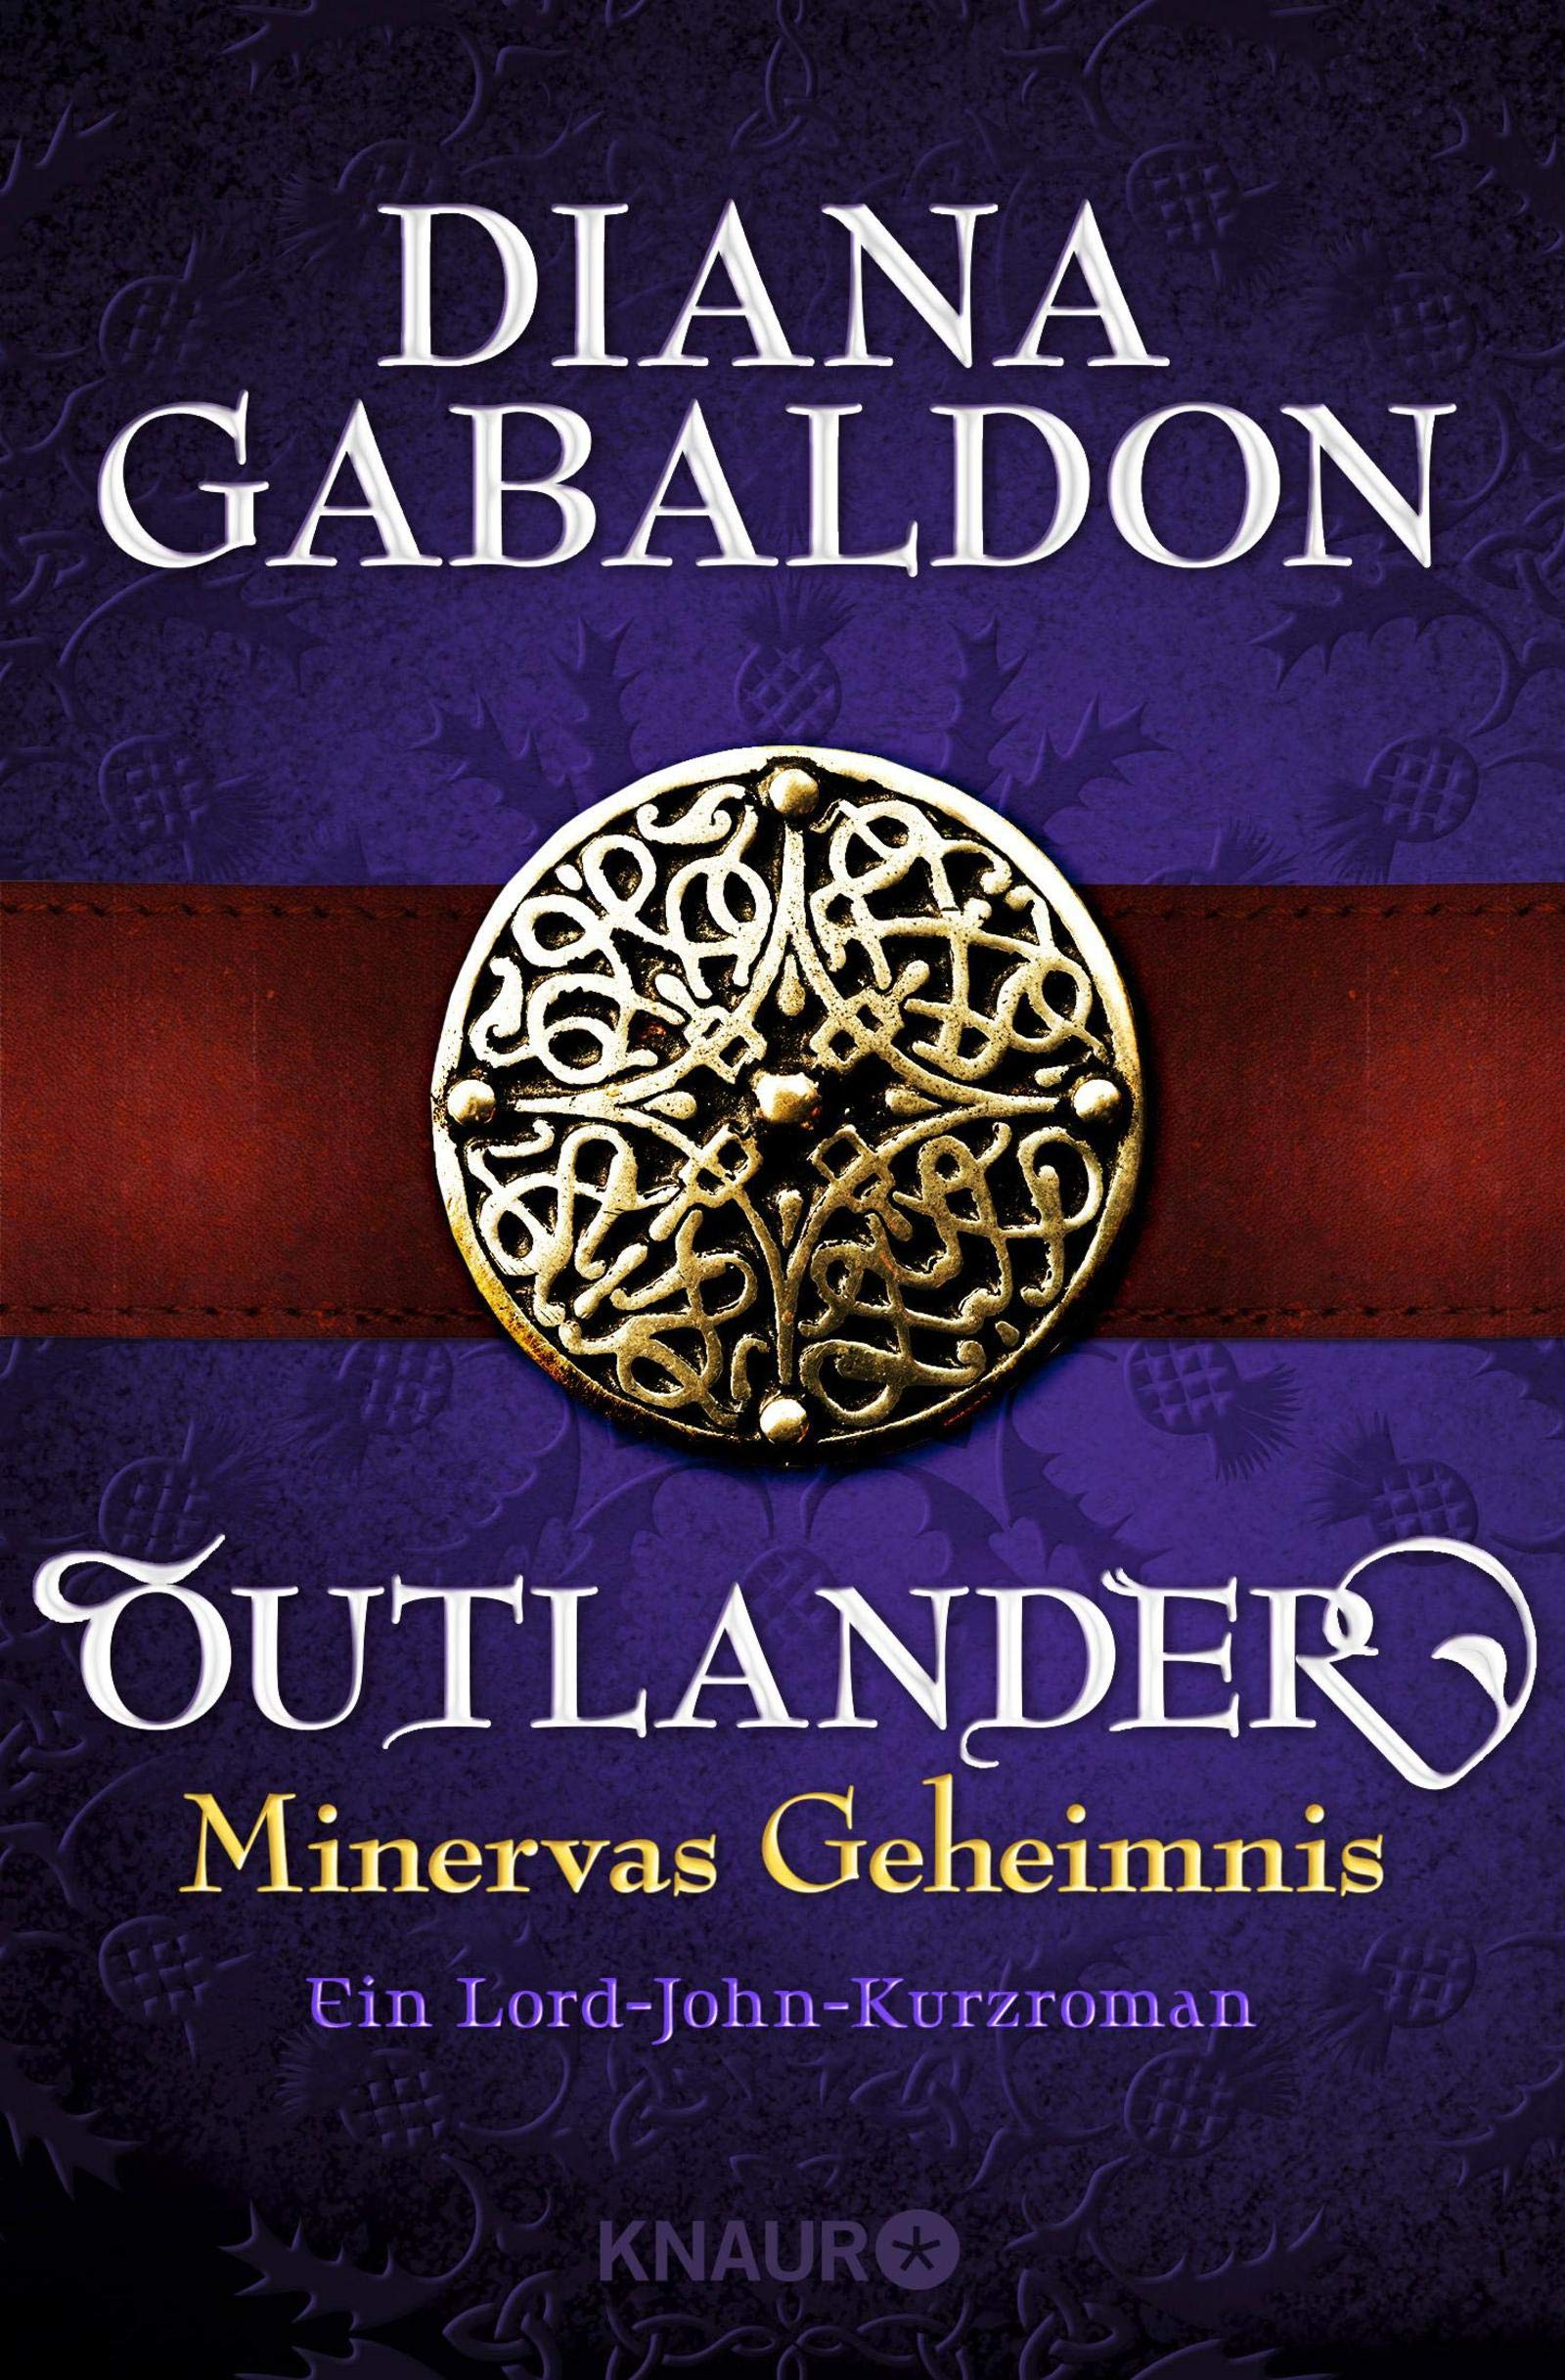 Outlander - Minervas Geheimnis: Ein Lord-John-Kurzroman